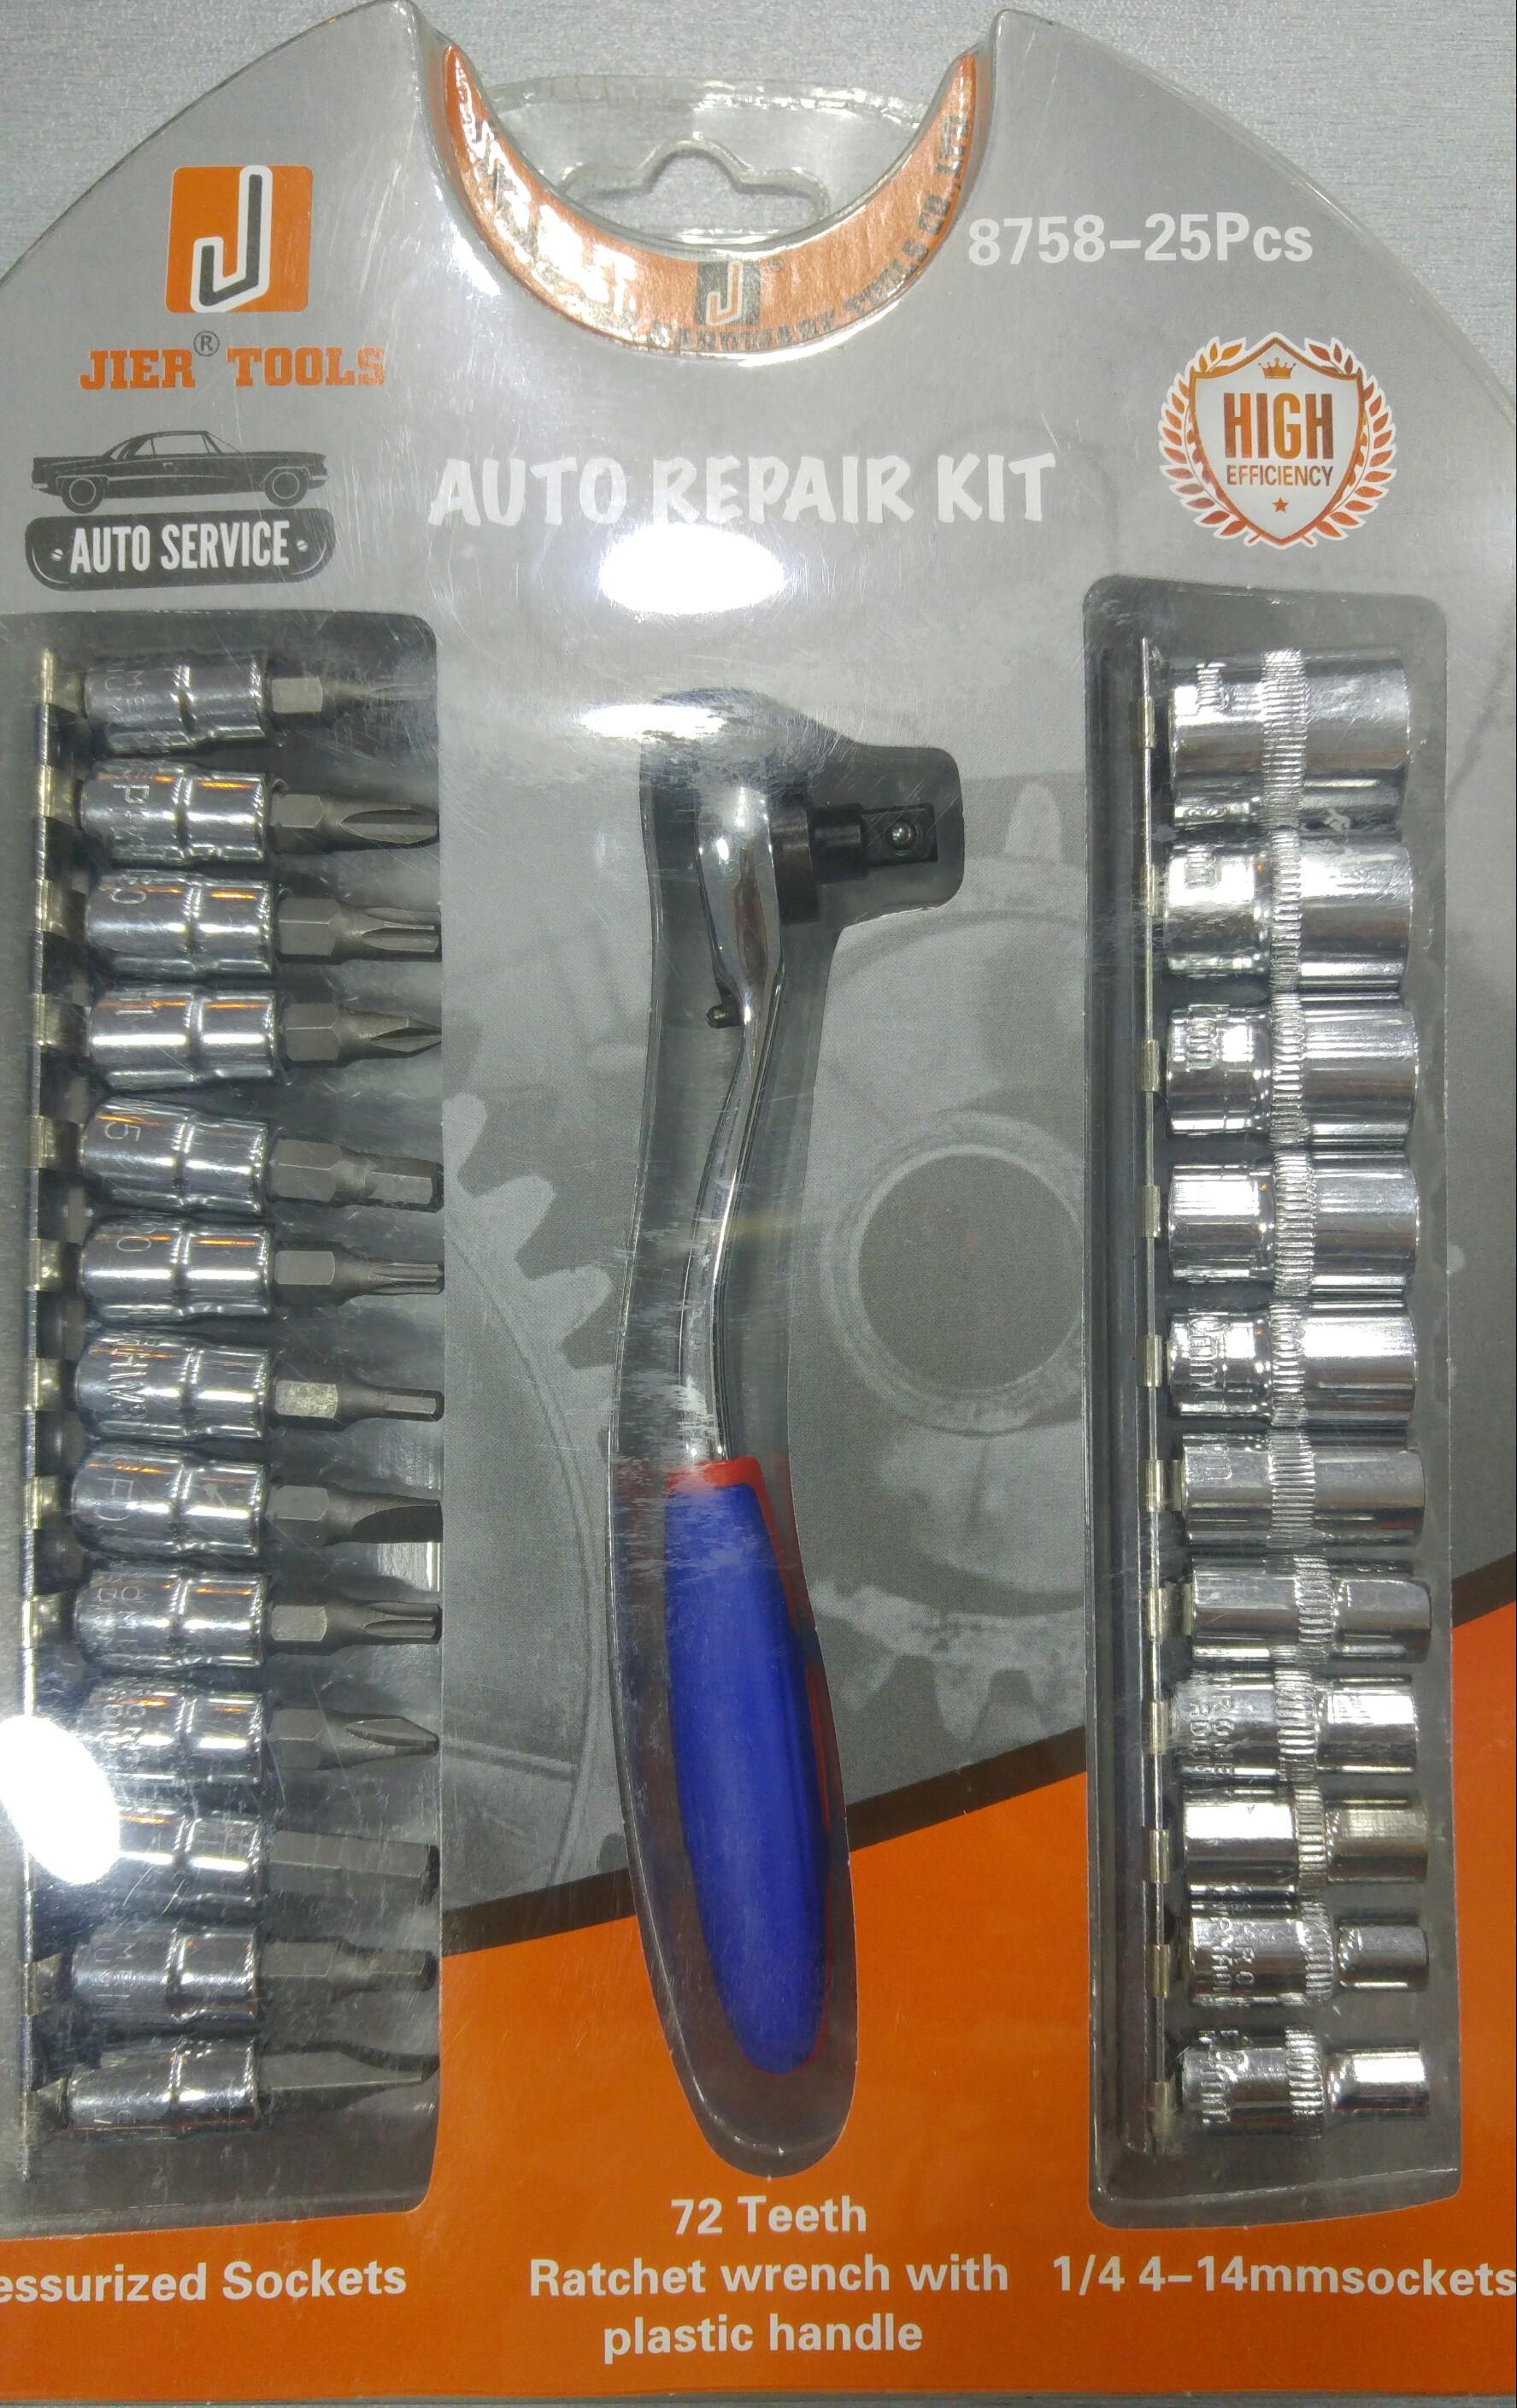 423fb4225581a AUTO REPAIR KIT 8758-25PCS